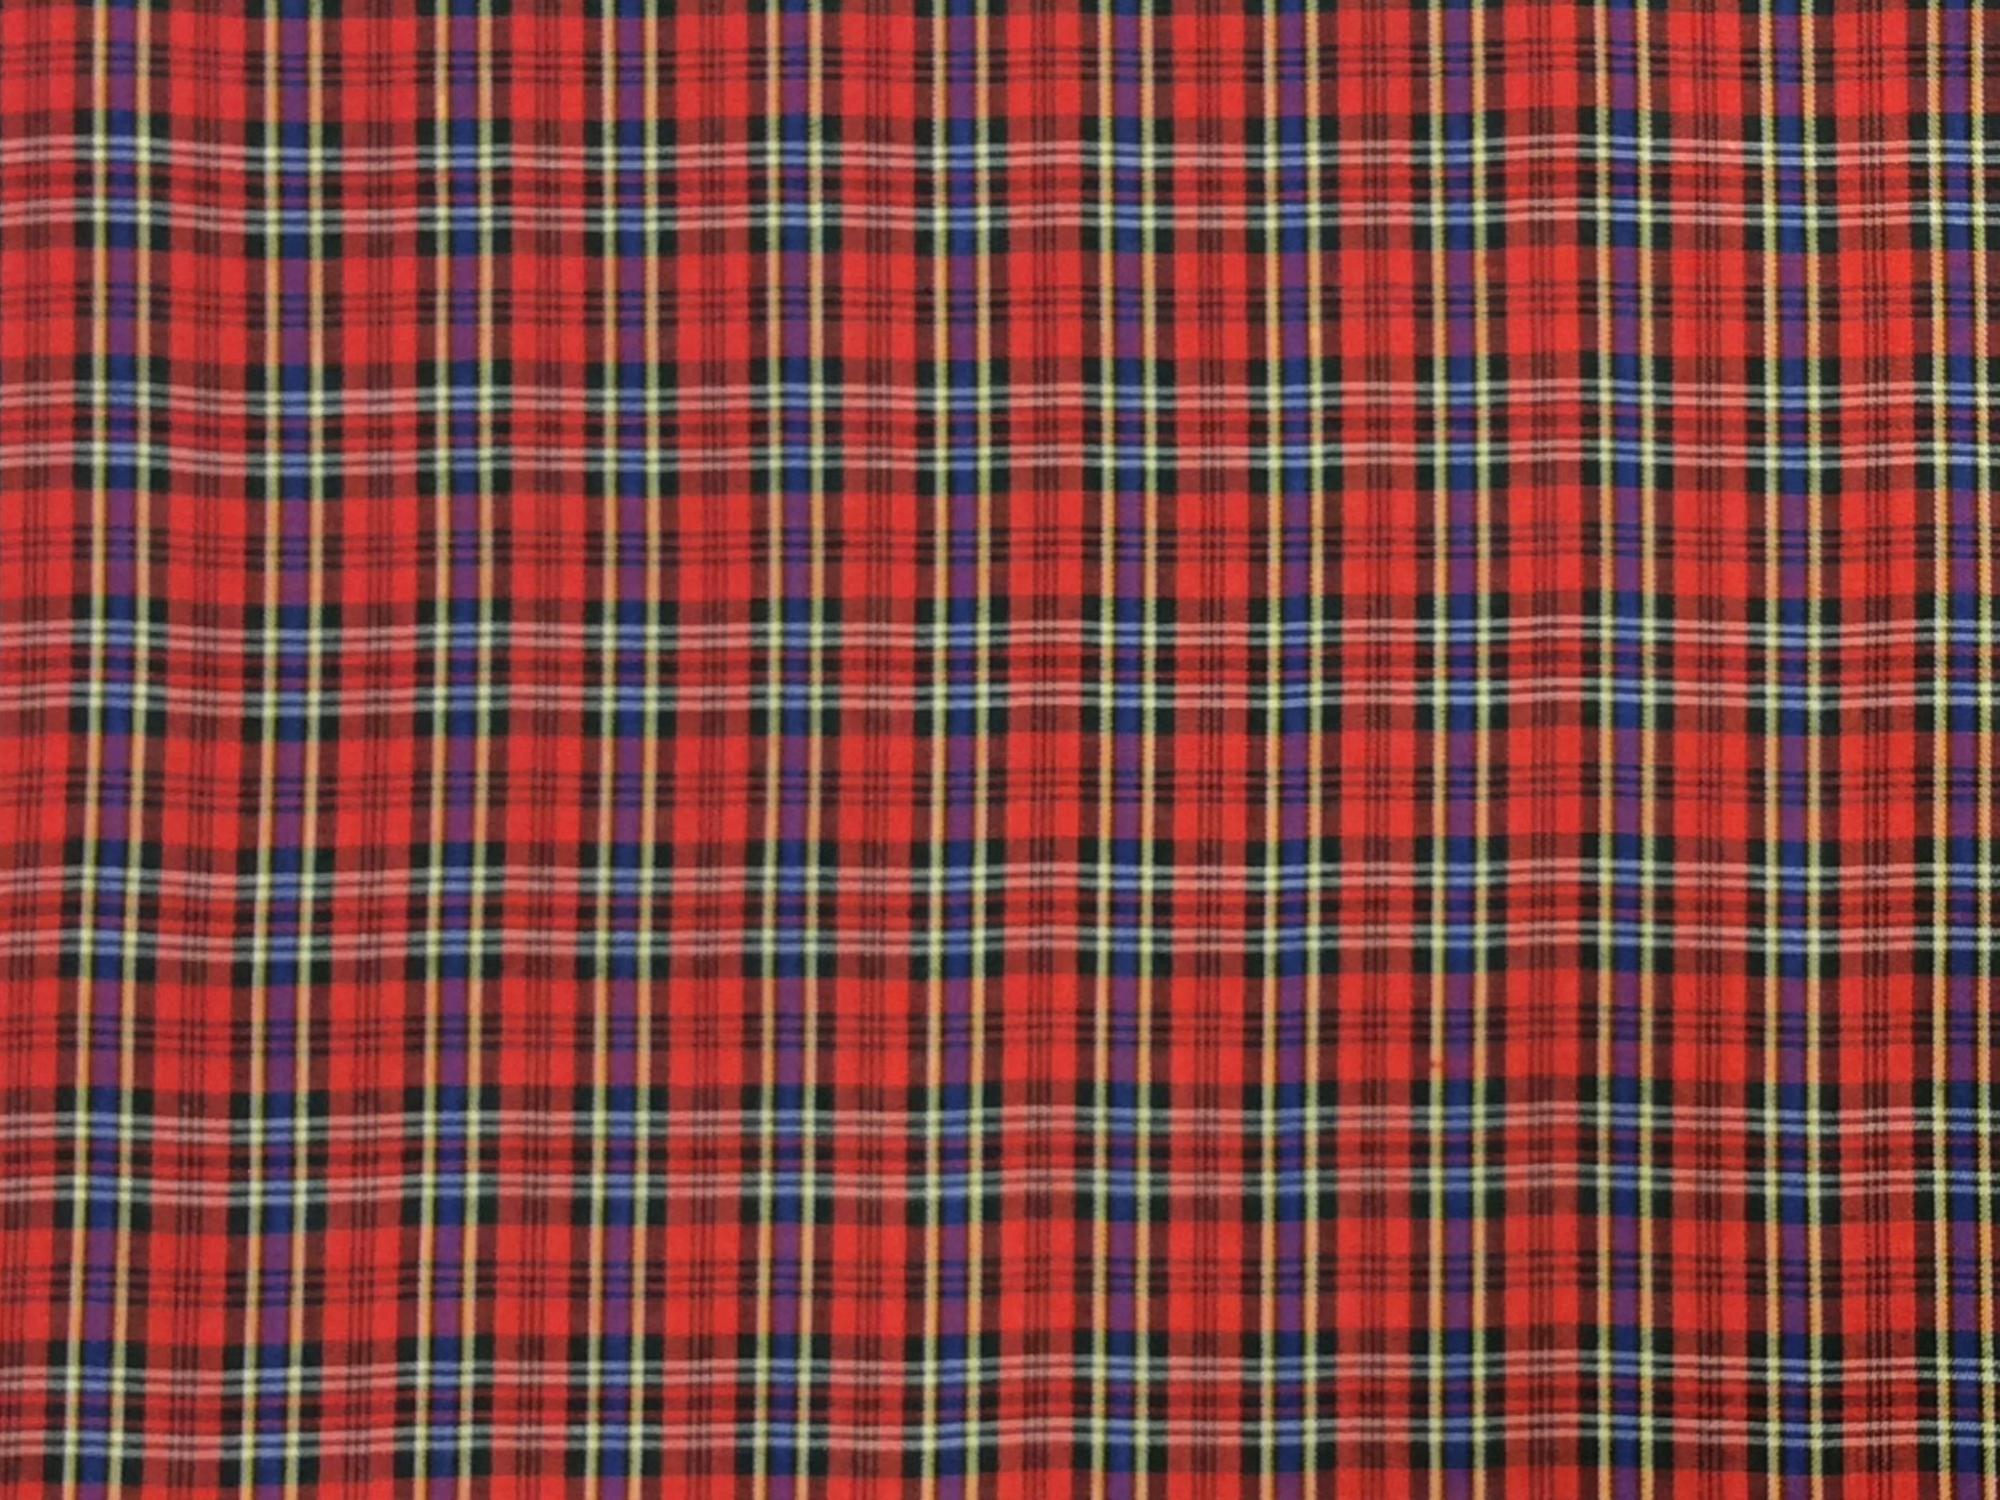 Tartan Plaid Albert Clan Apparel Fabric Yarn Dyed Fabric FTP23